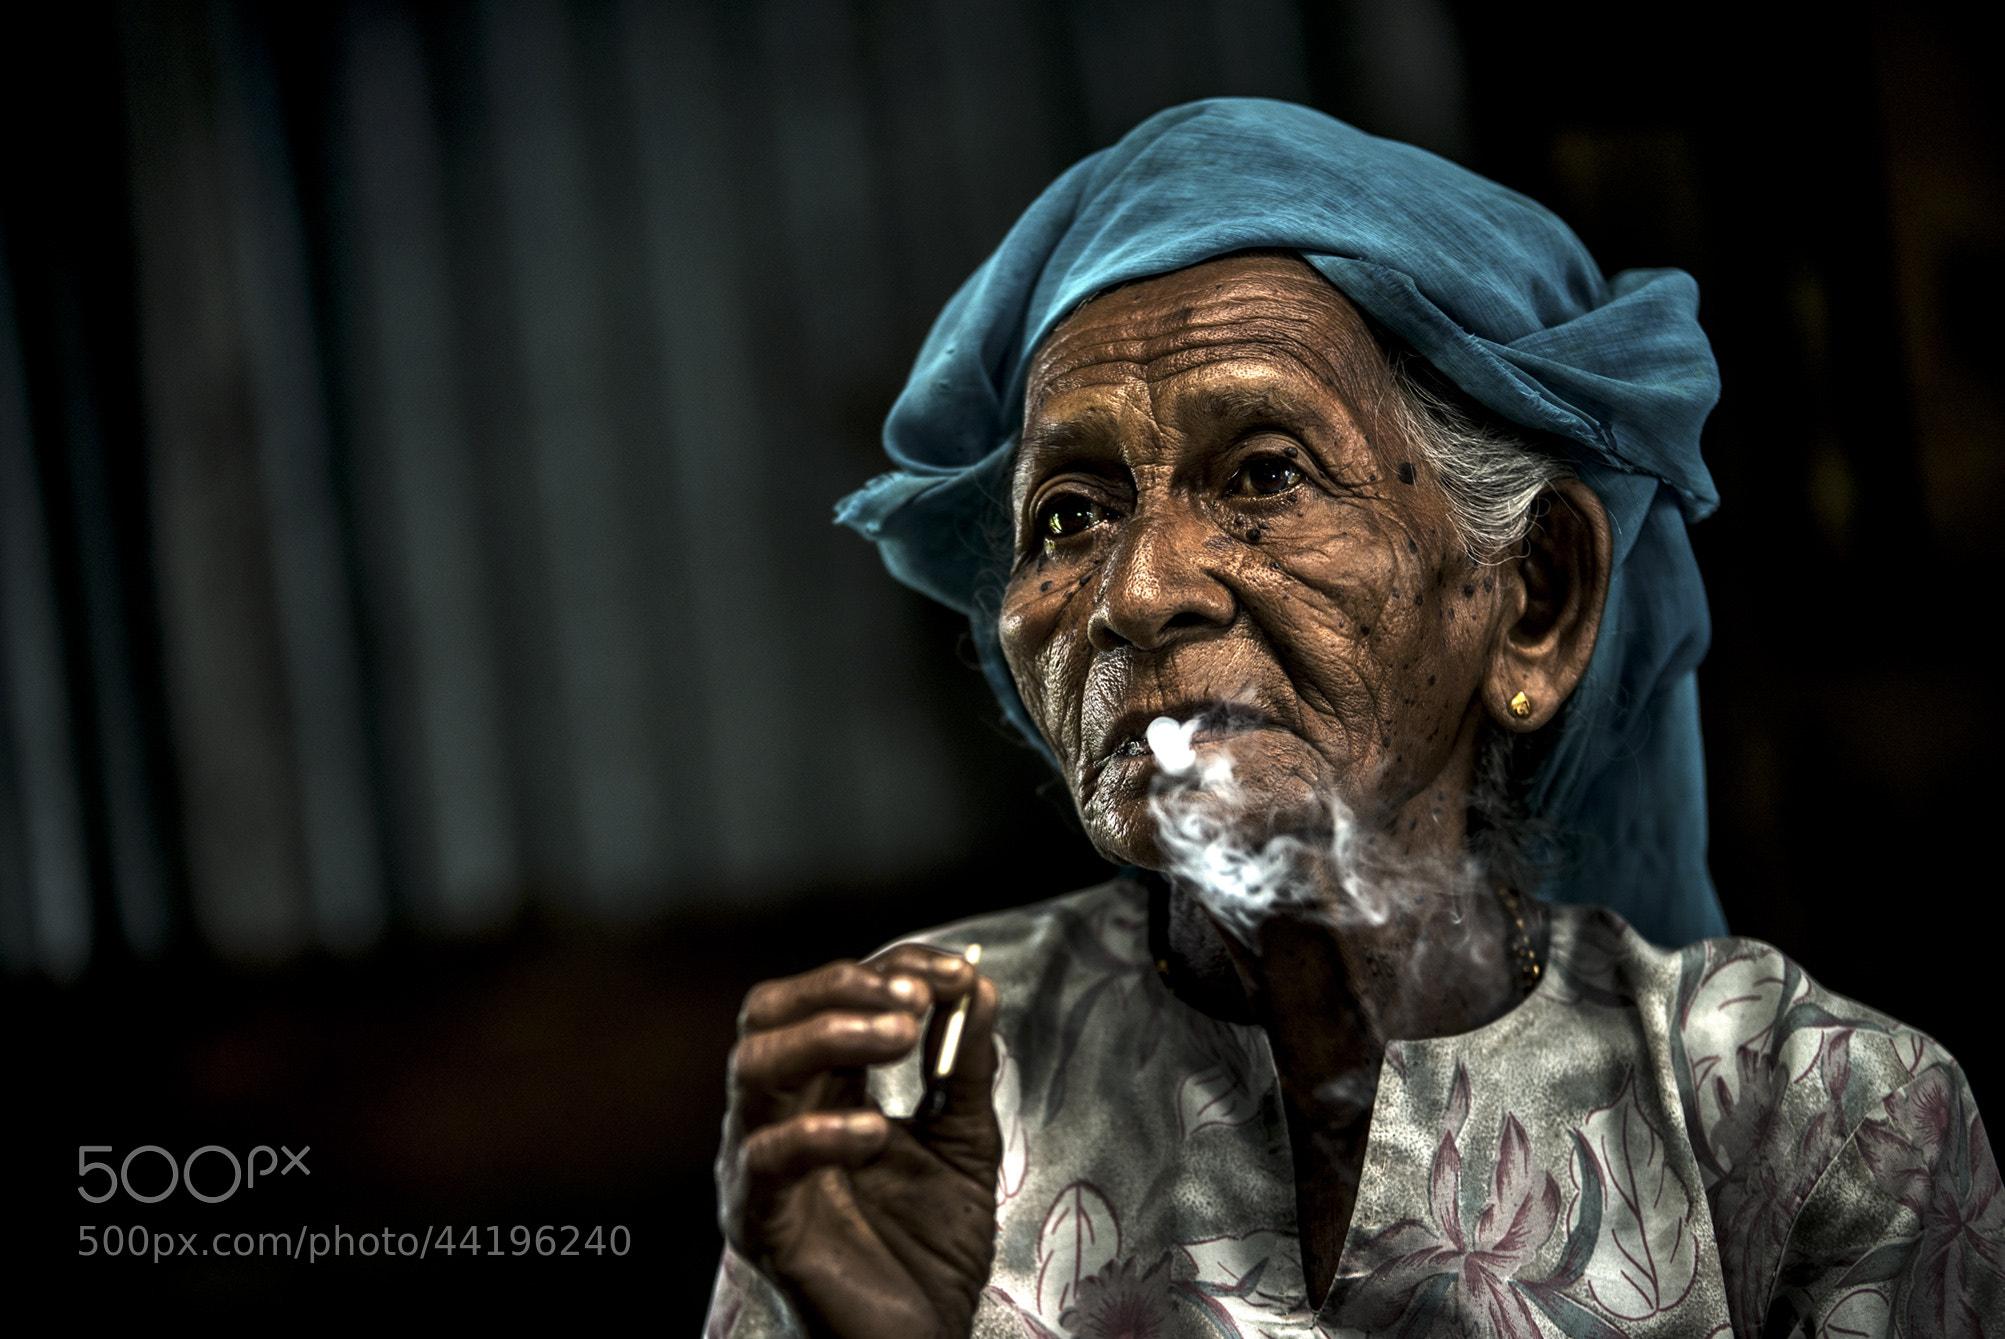 Photograph MAK ESAH by Zaid Ishak on 500px